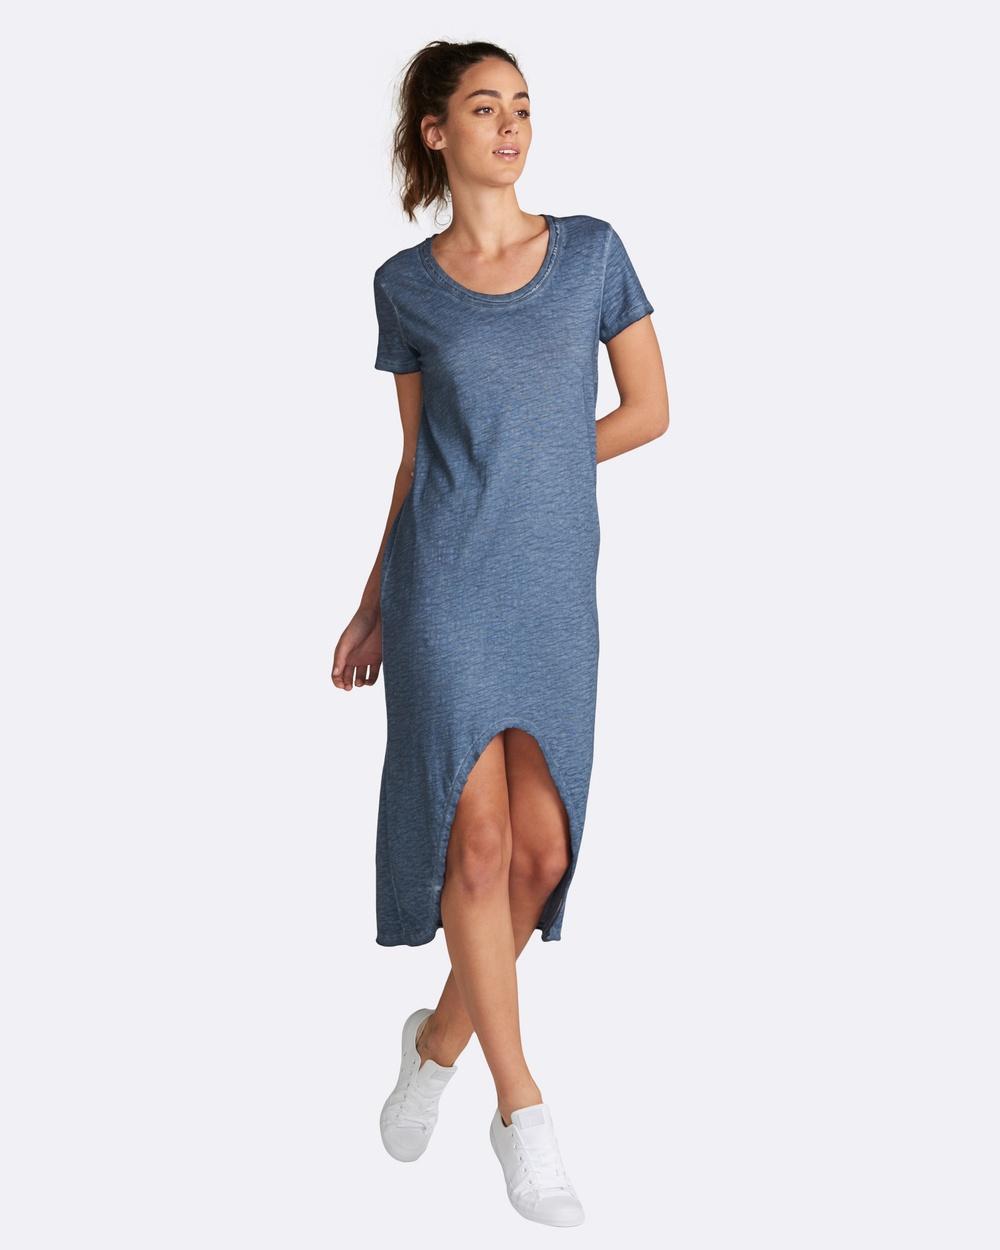 jac + mooki Maisie Dress Dresses Blue Maisie Dress